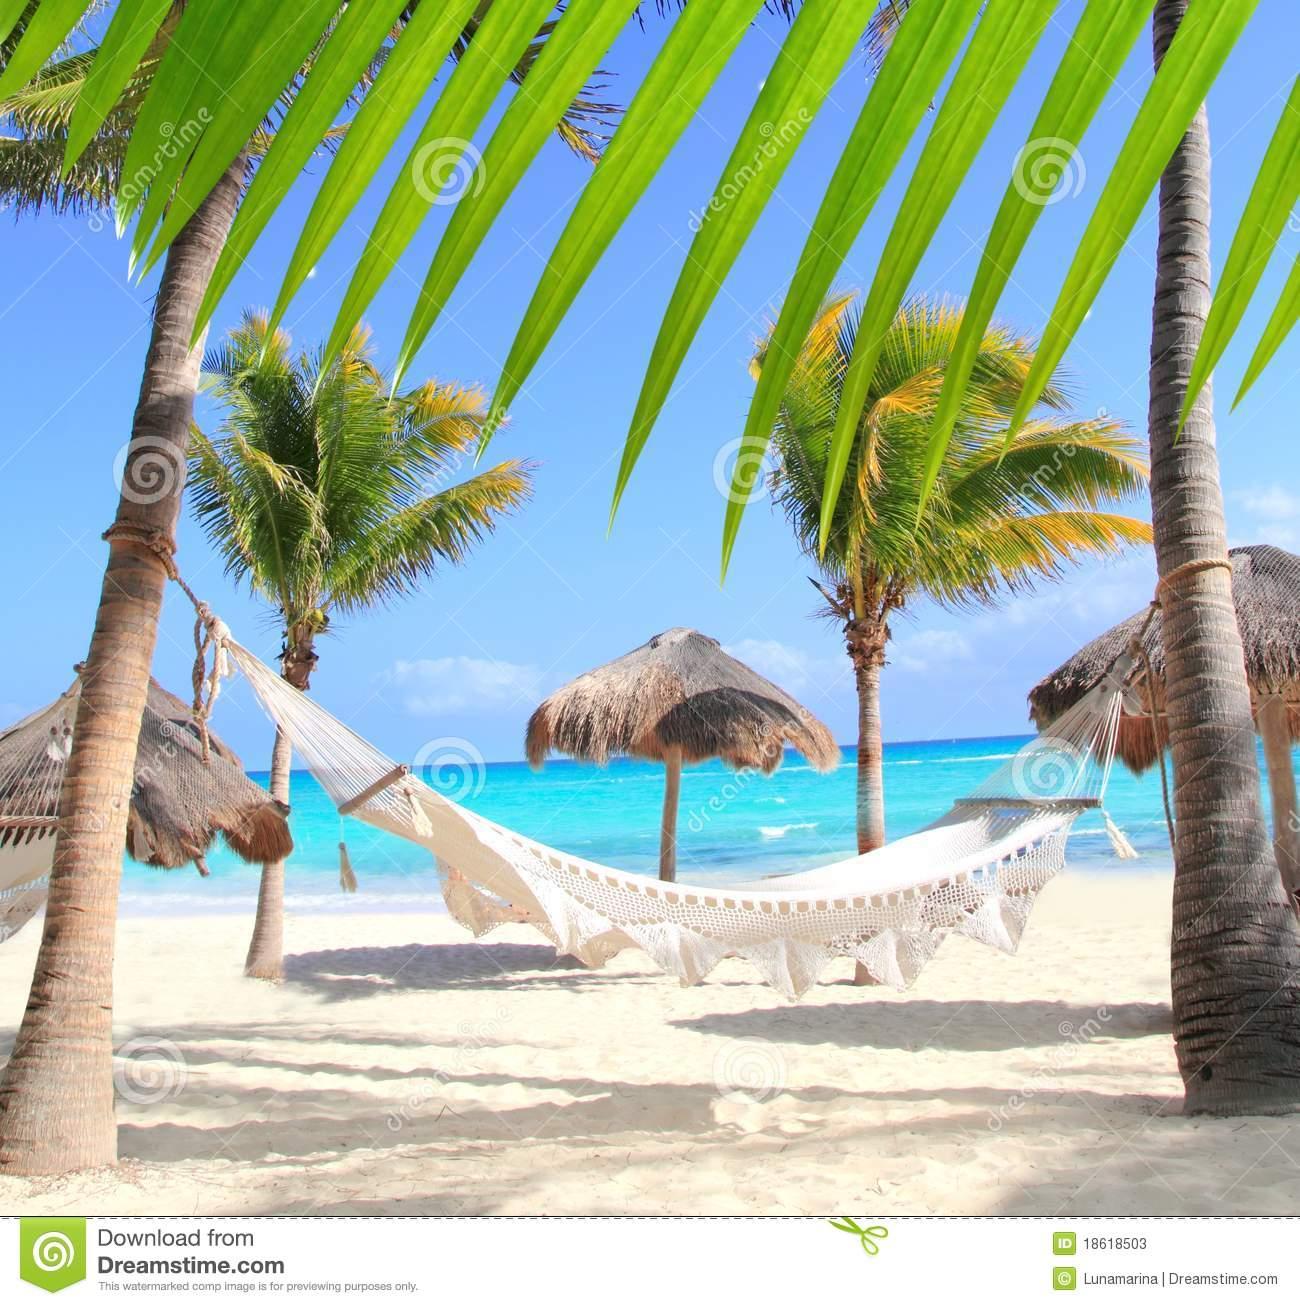 Caribbean beach hammock and palm trees in Mayan Riviera Mexico 1300x1306